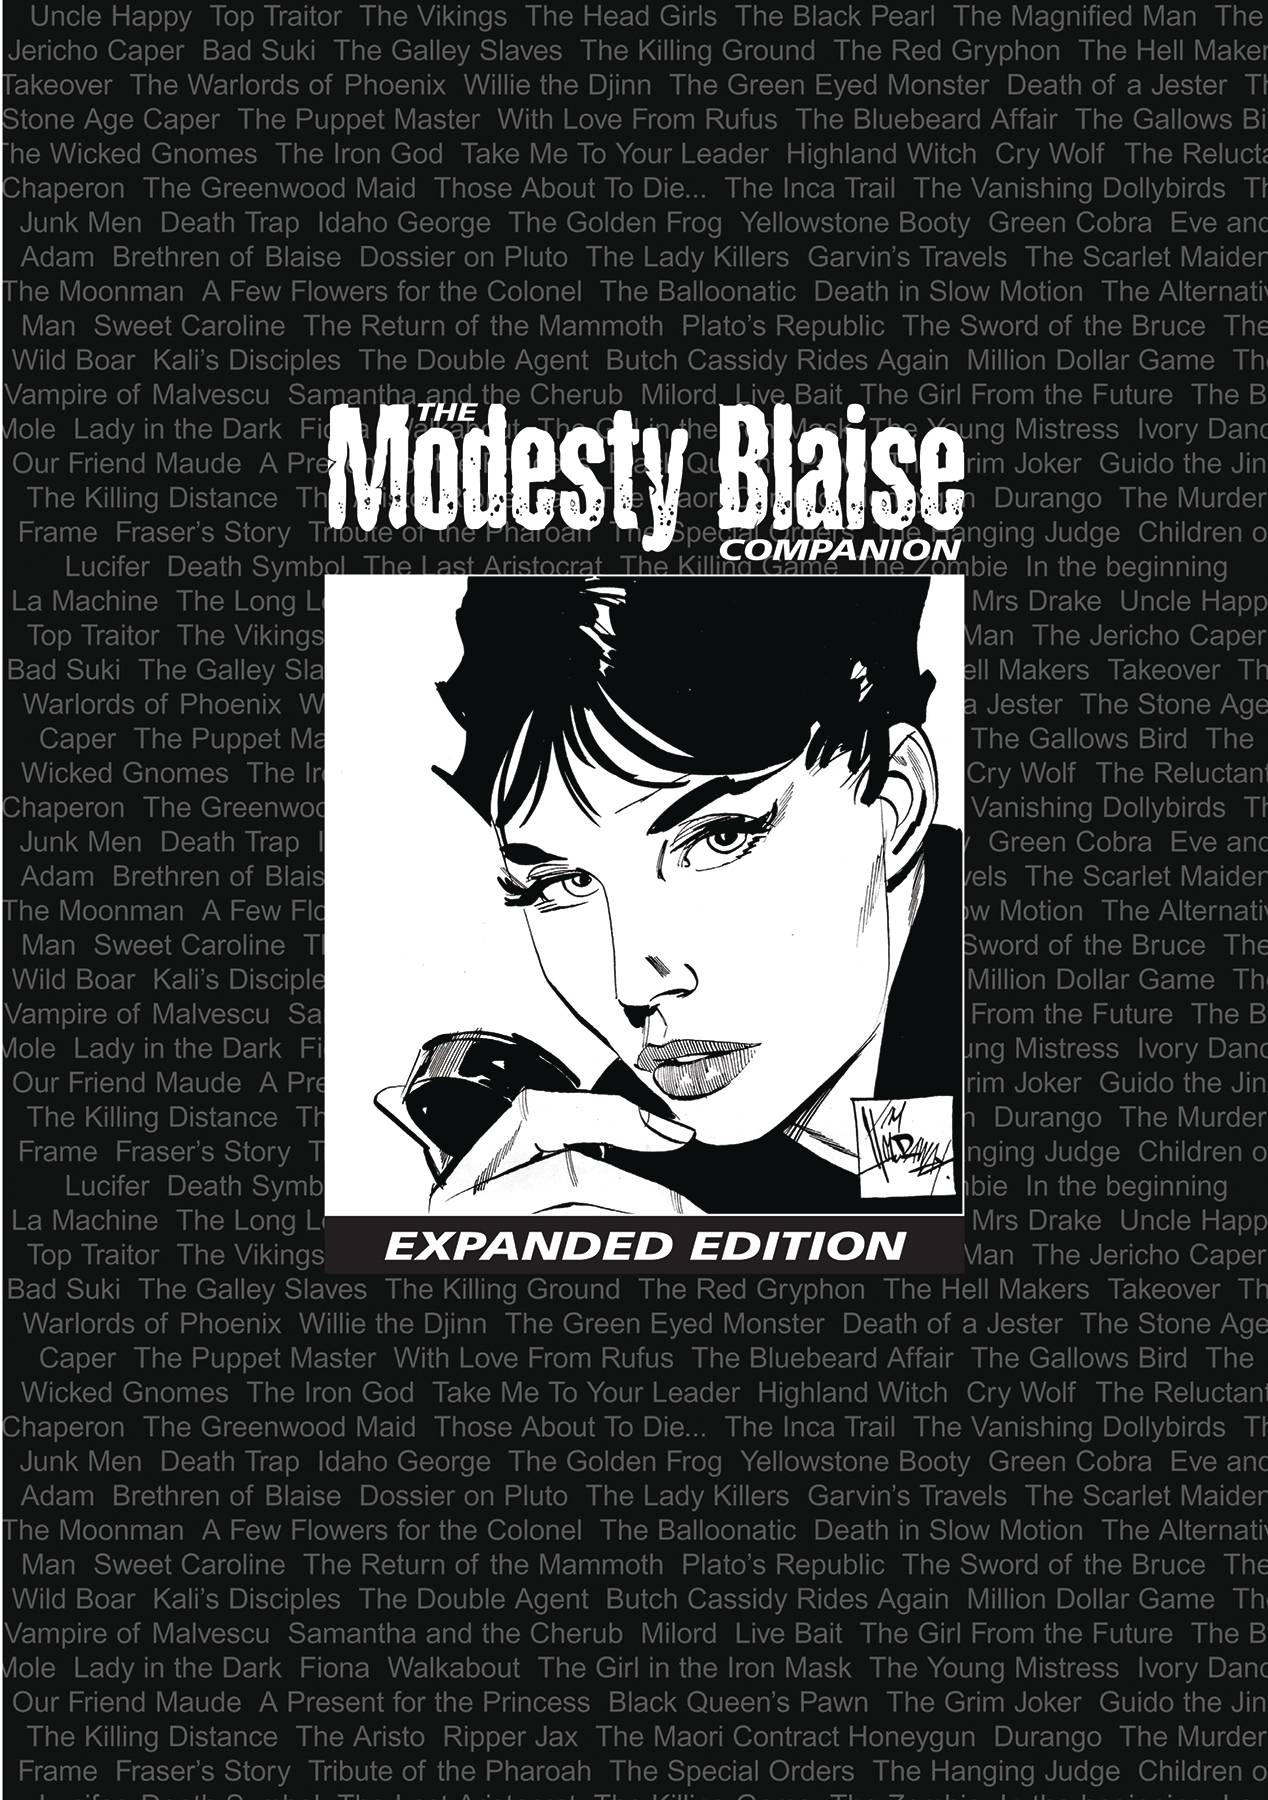 MODESTY BLAISE COMPANION EXPANDED EDITION TP